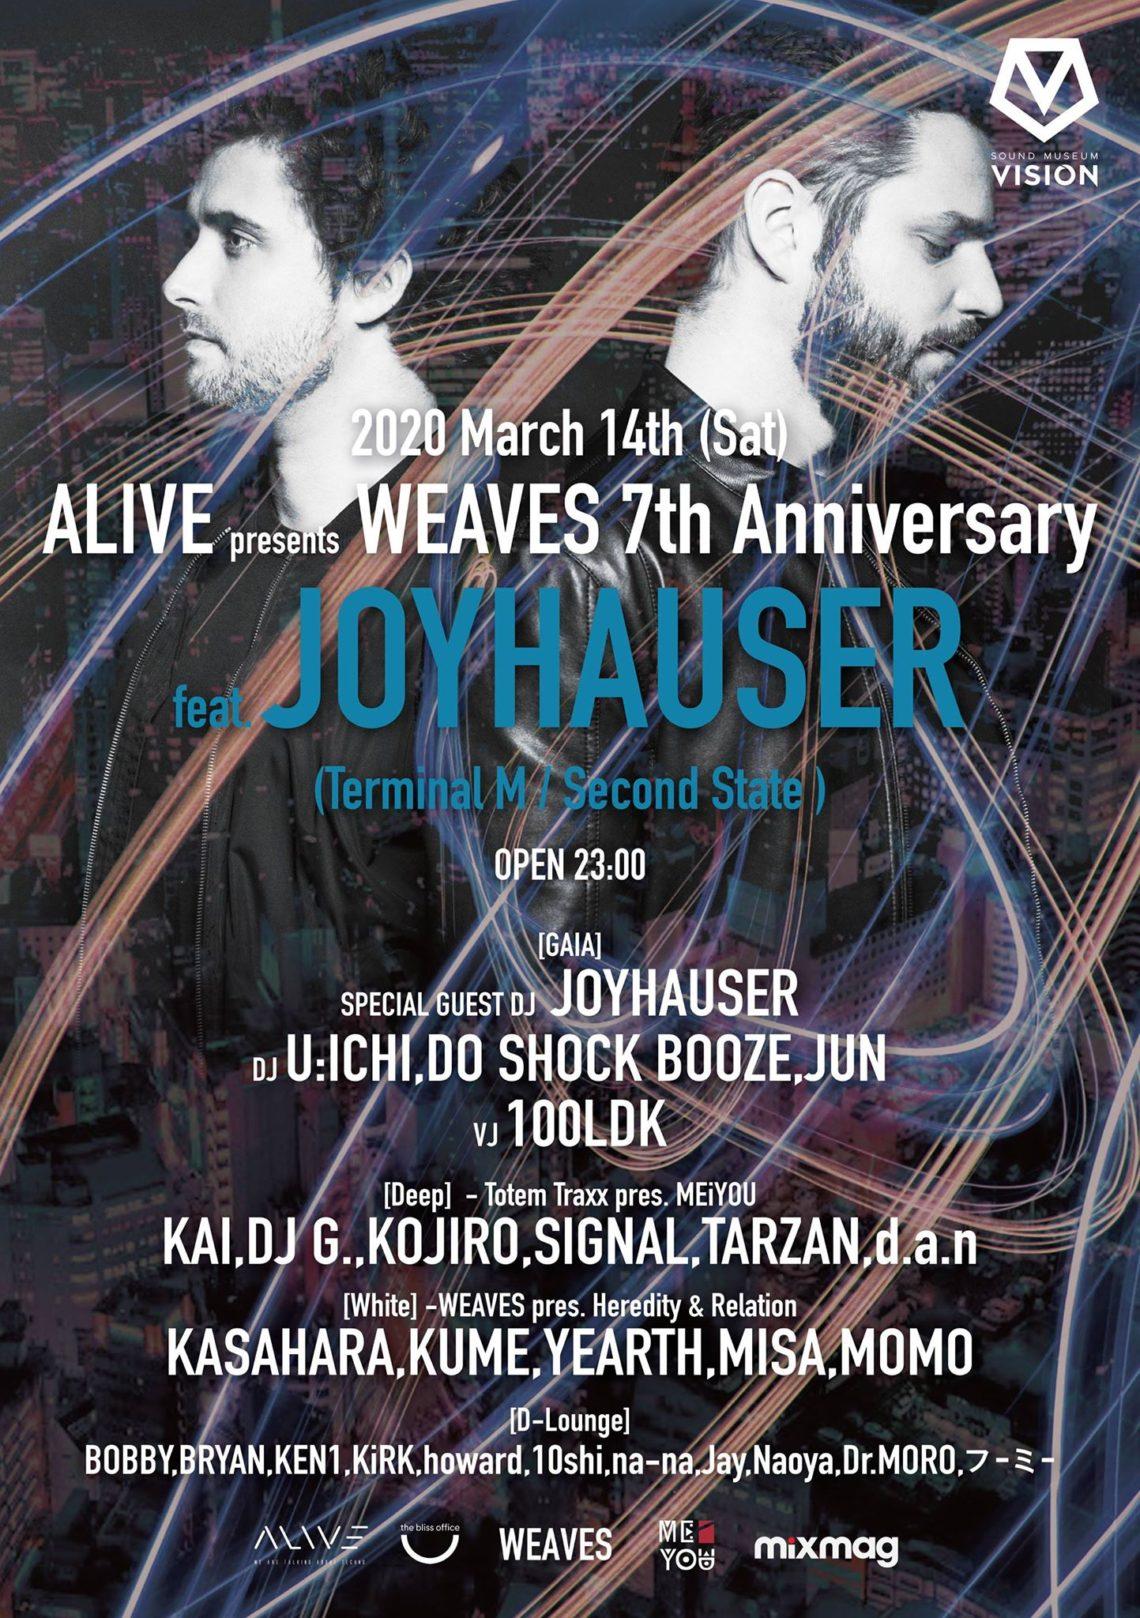 2020. 3. 14 SAT– KAI : DJ@Sound Museum Vision Tokyo / ALIVE presents WEAVES 7th Anniversary feat. Joyhauser